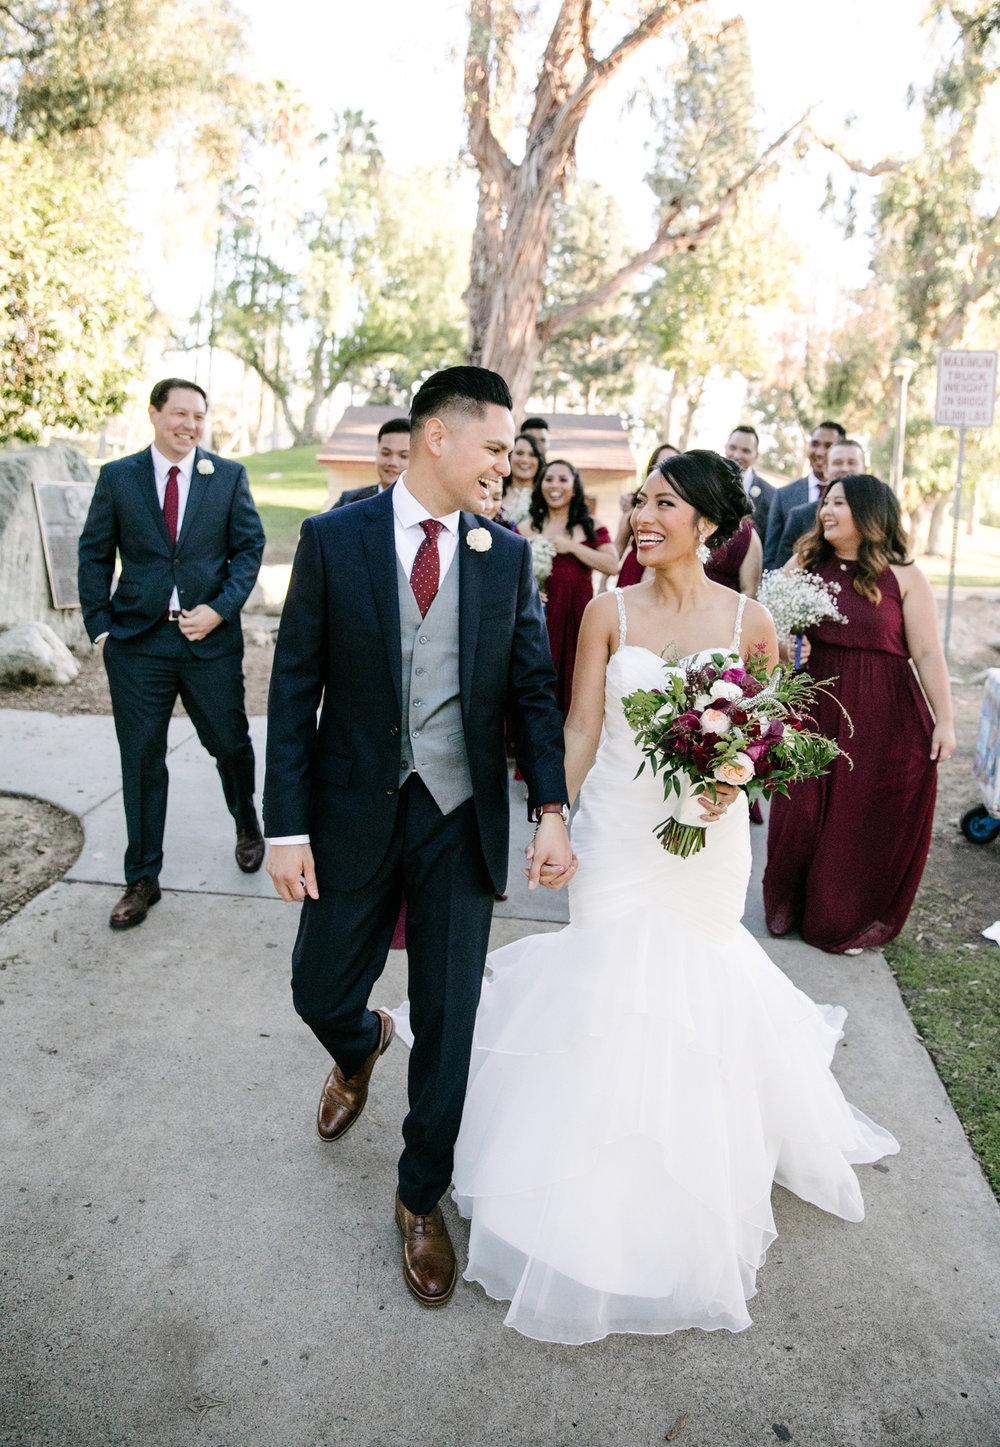 171-wilcox-manor-wedding.jpg